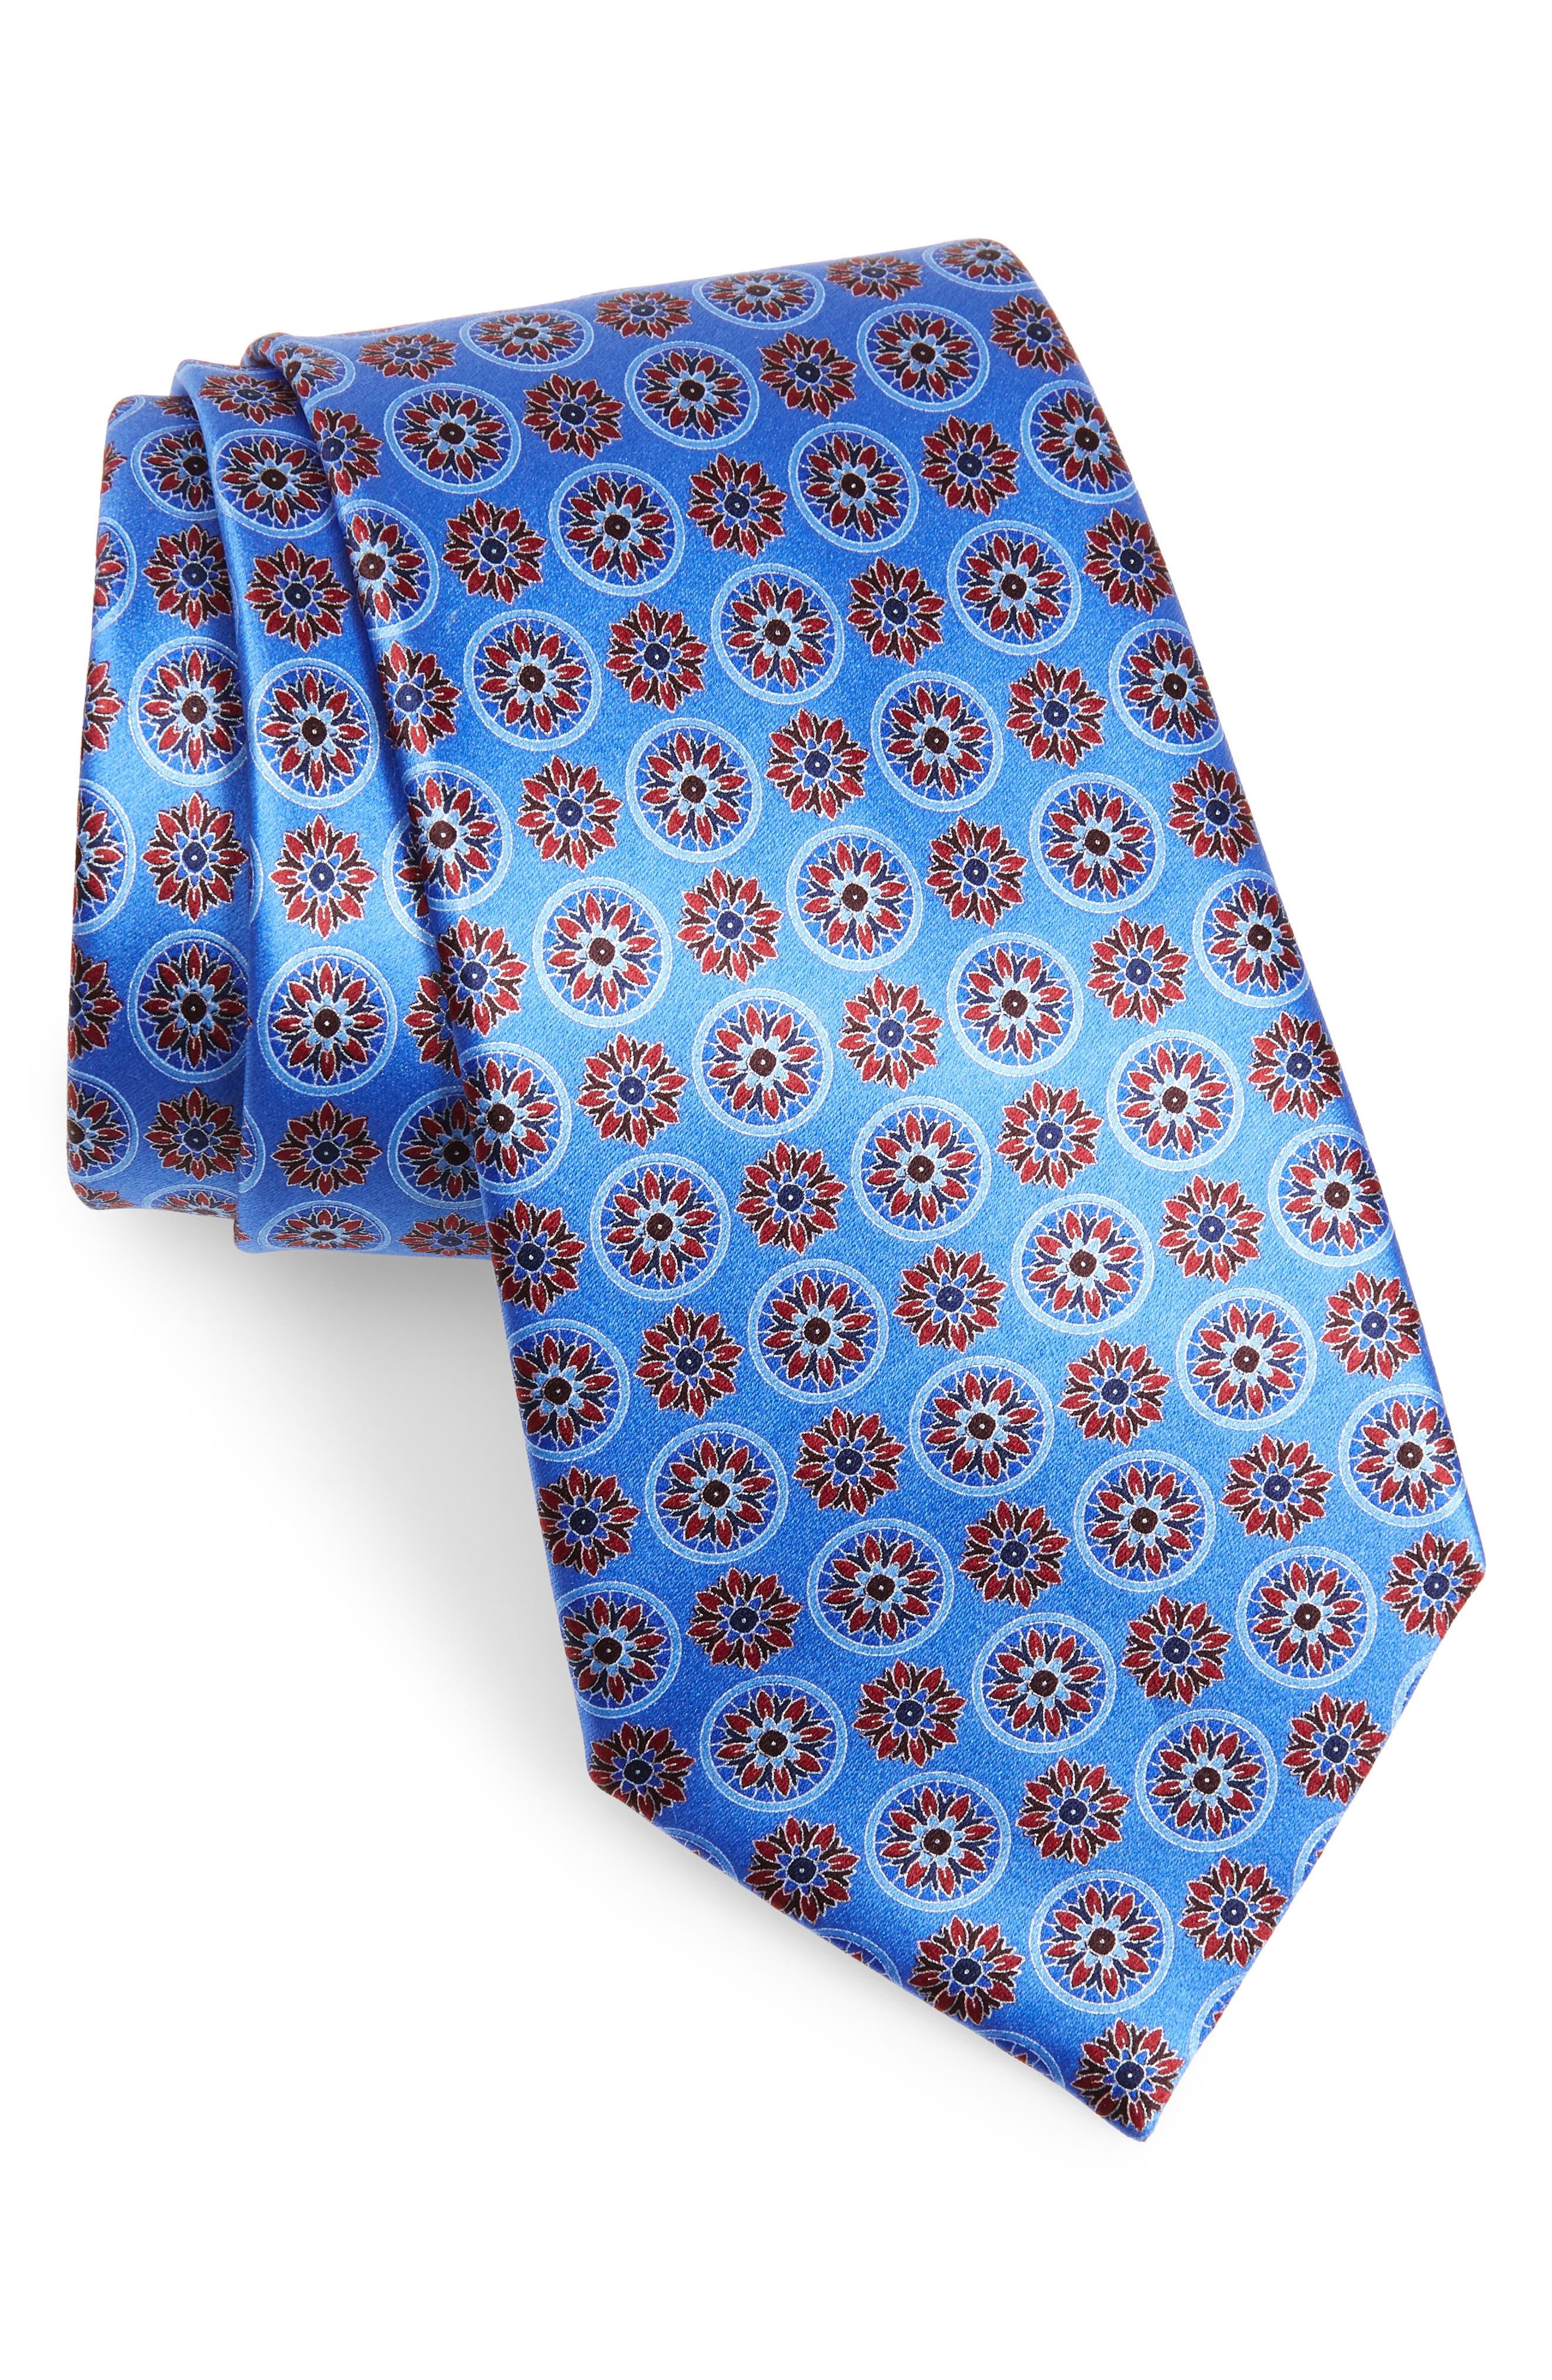 ERMENEGILDO ZEGNA Floral Medallion Silk Tie, Main, color, BLUE